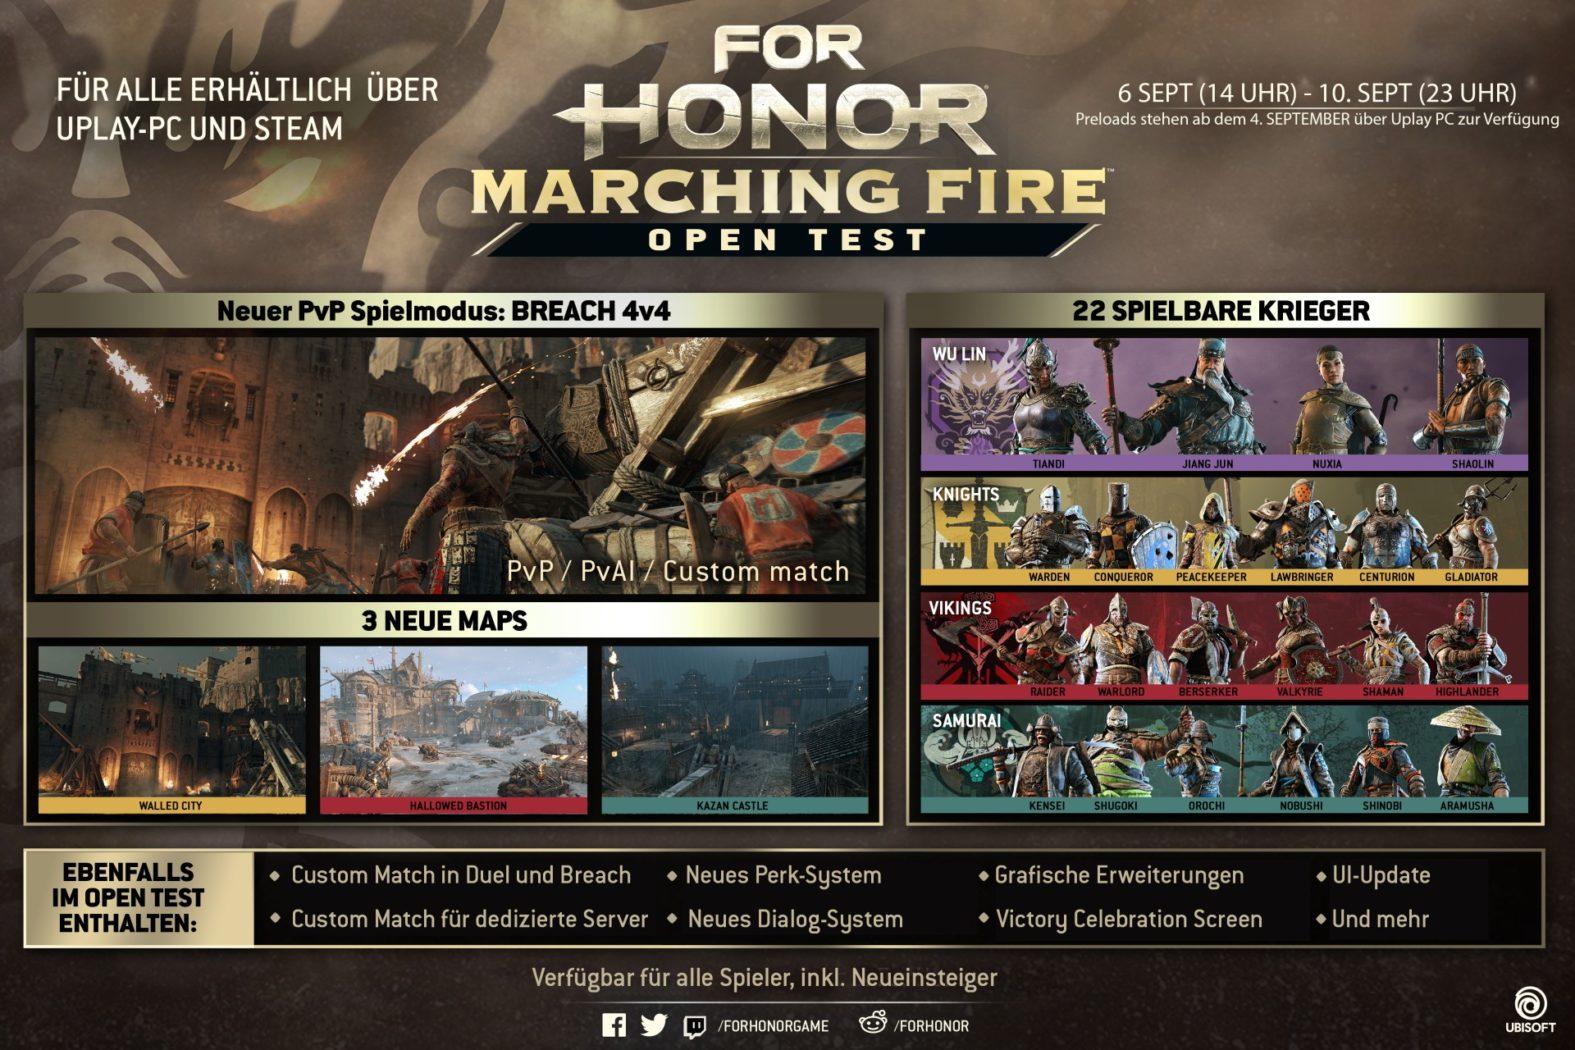 Marching Fire Open Test